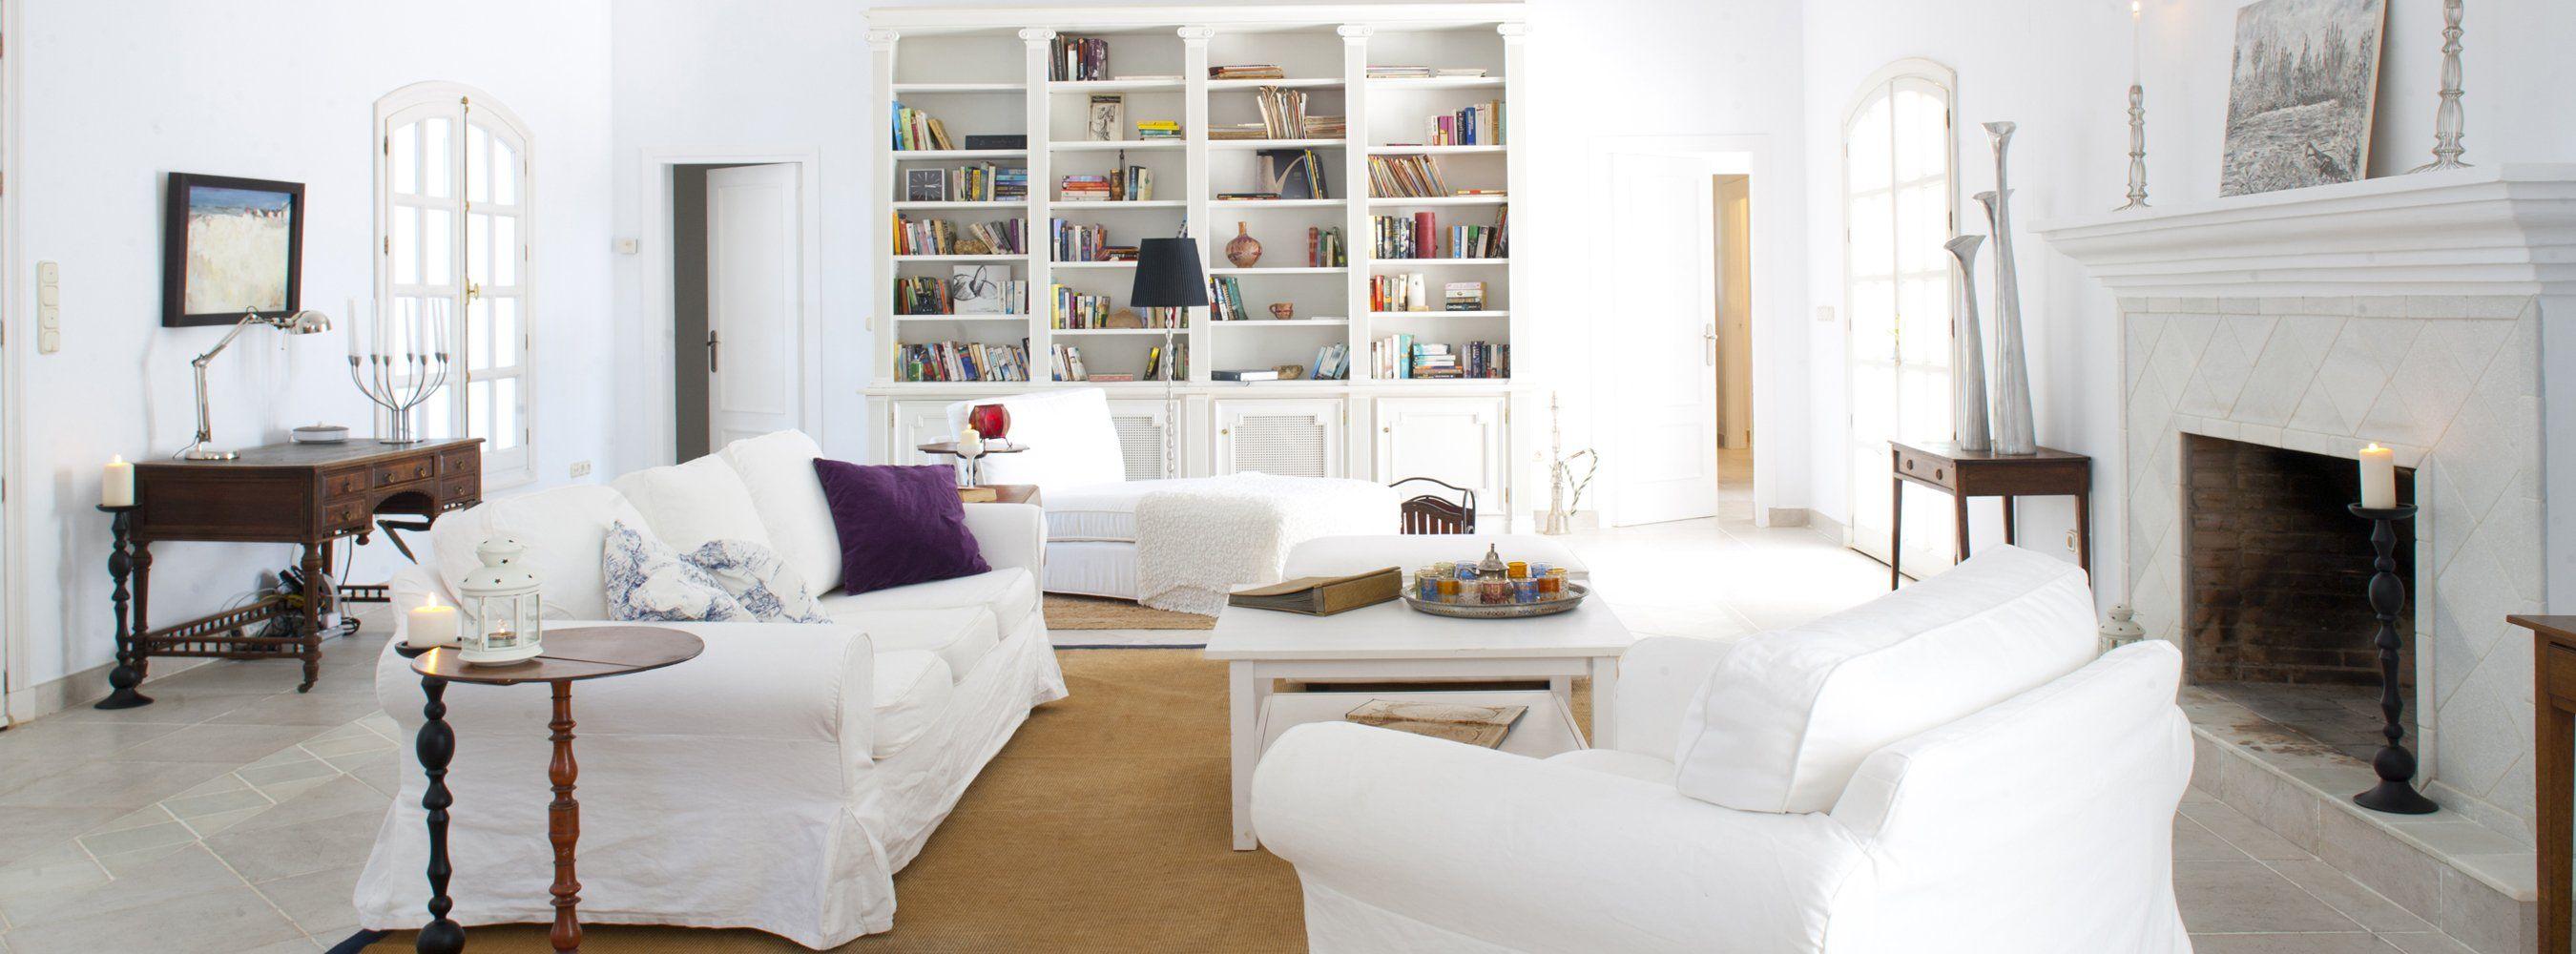 villa sittingroom andalucia